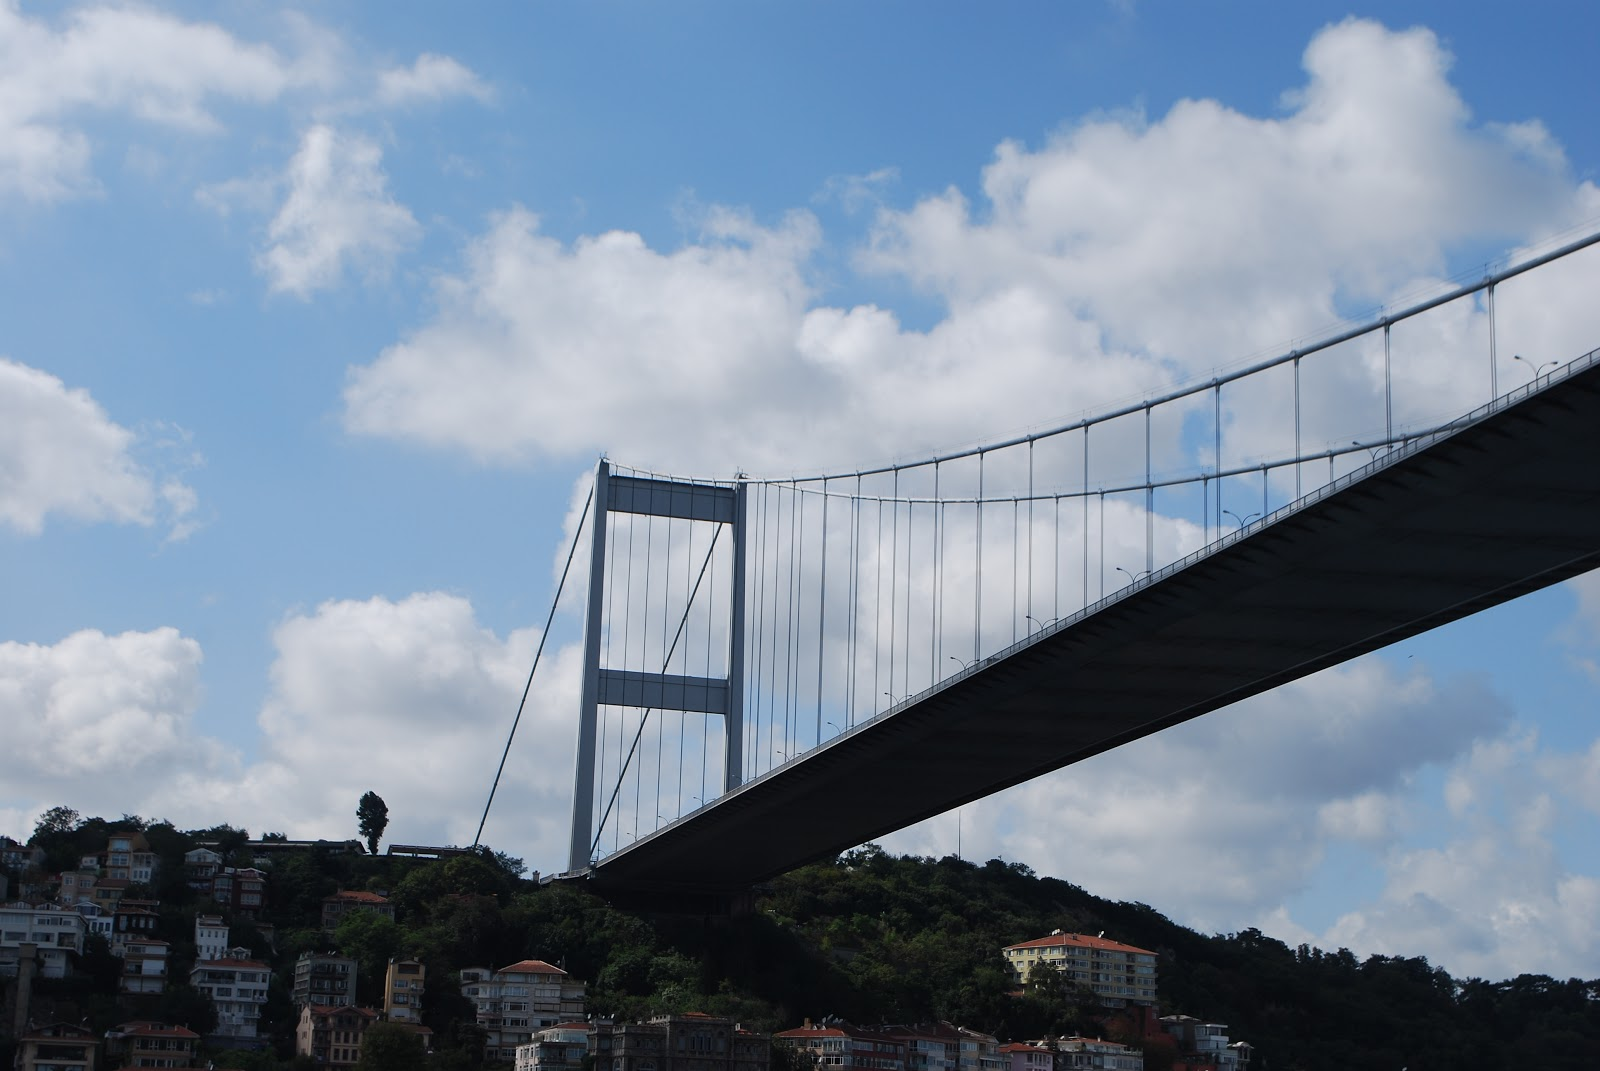 http://4.bp.blogspot.com/_pv5ccRkAhck/TKE9VD1oQjI/AAAAAAAABhQ/cdRvE3eg5rQ/s1600/Bosphorus+Cruise+%2878%29.JPG